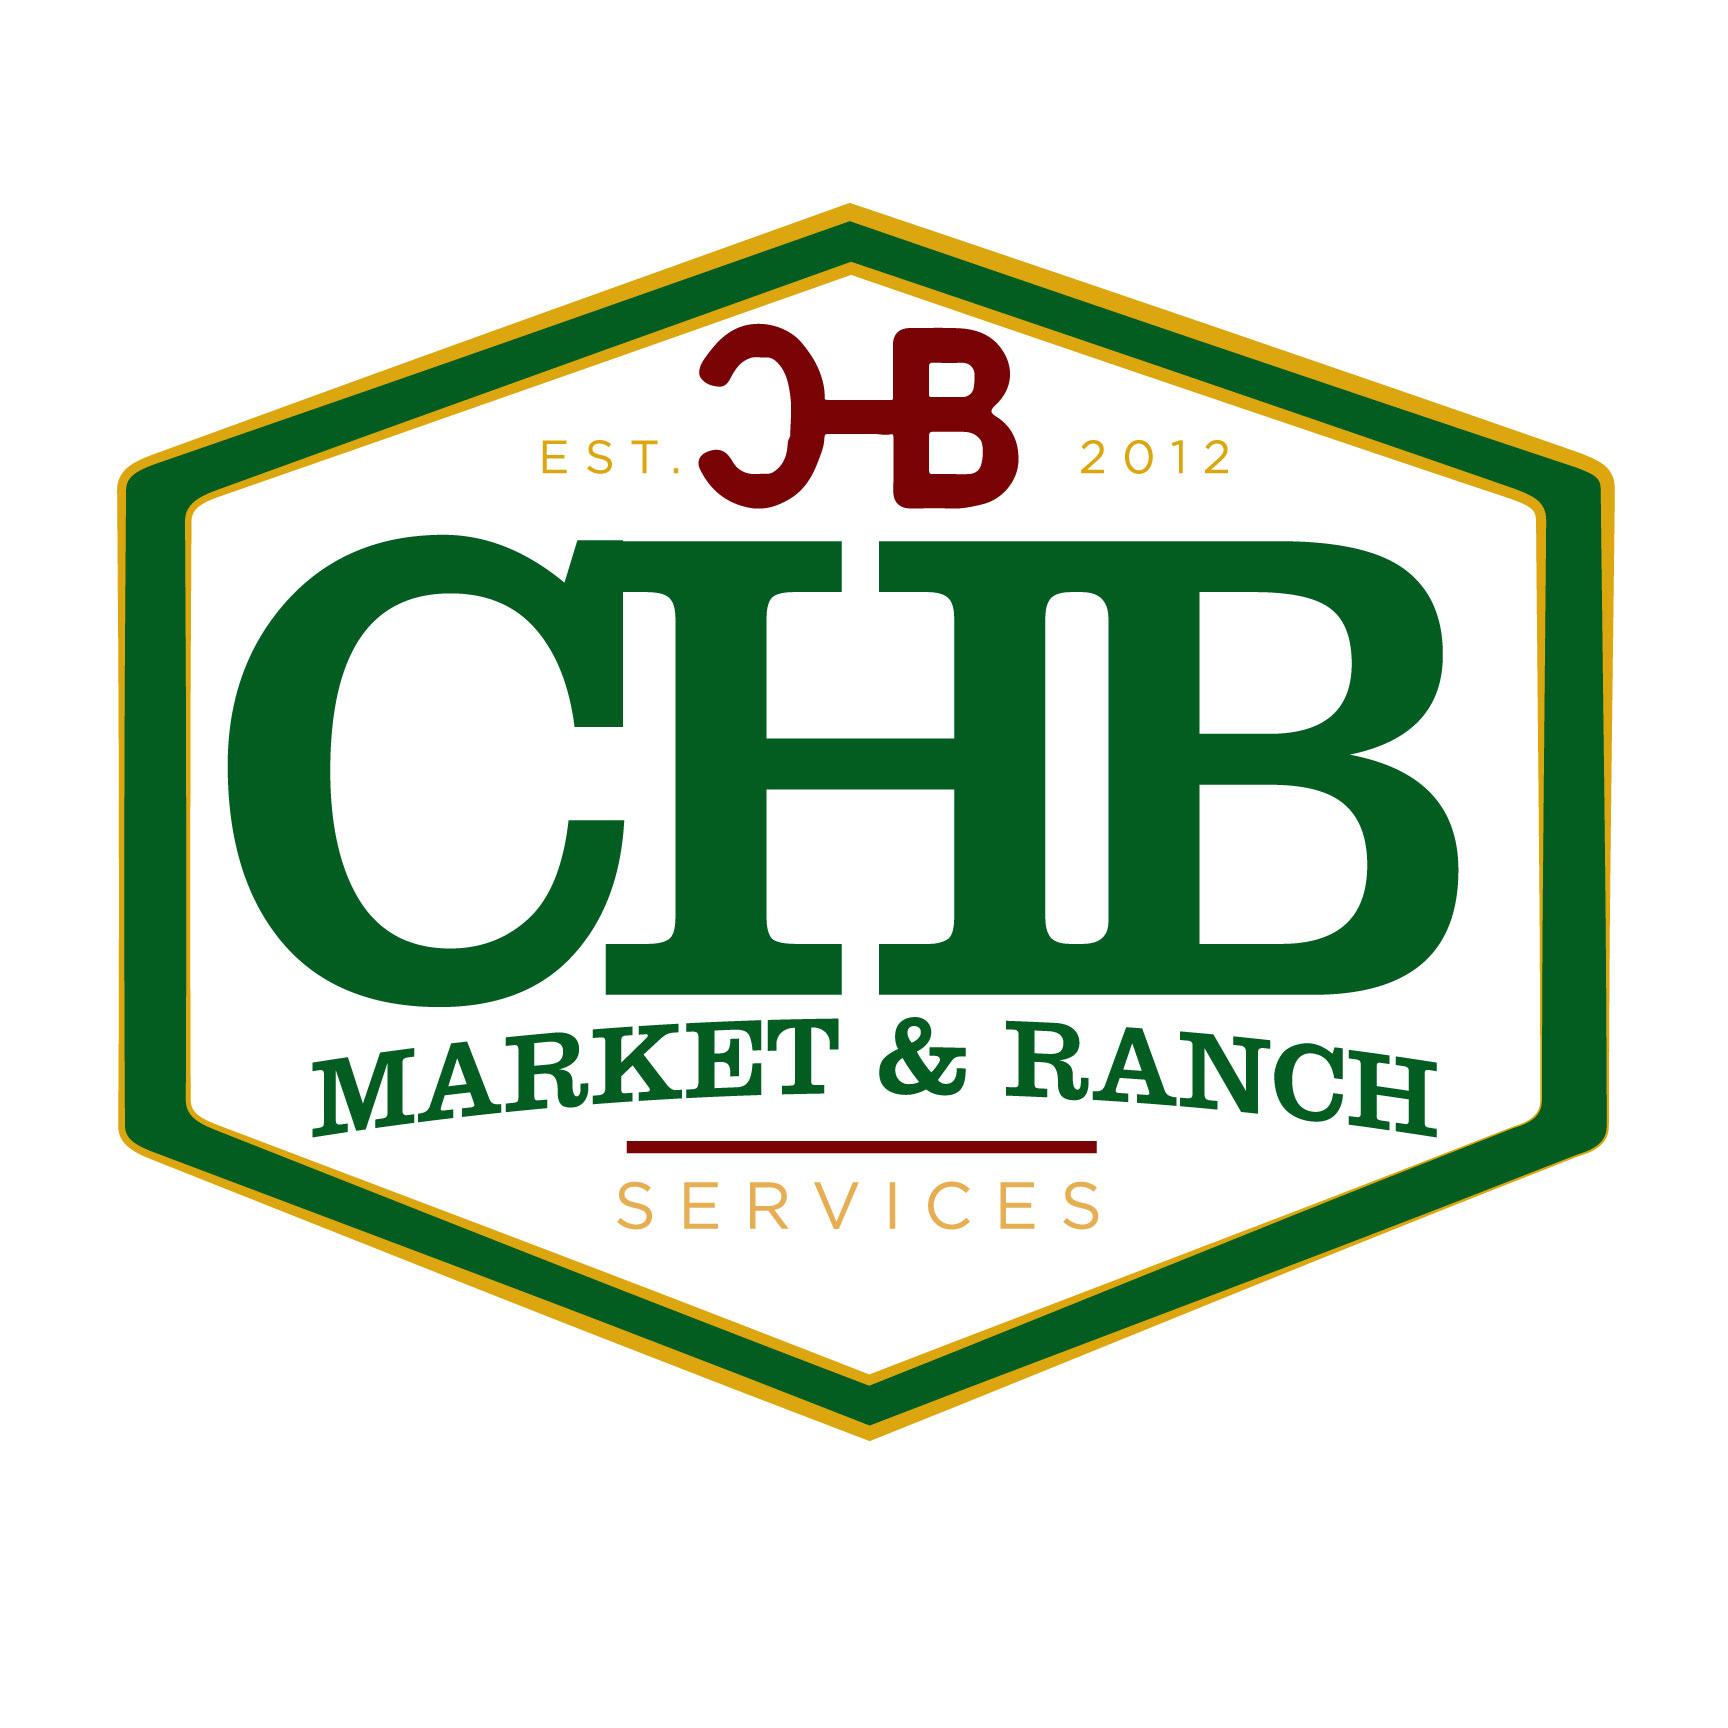 CHB green logo